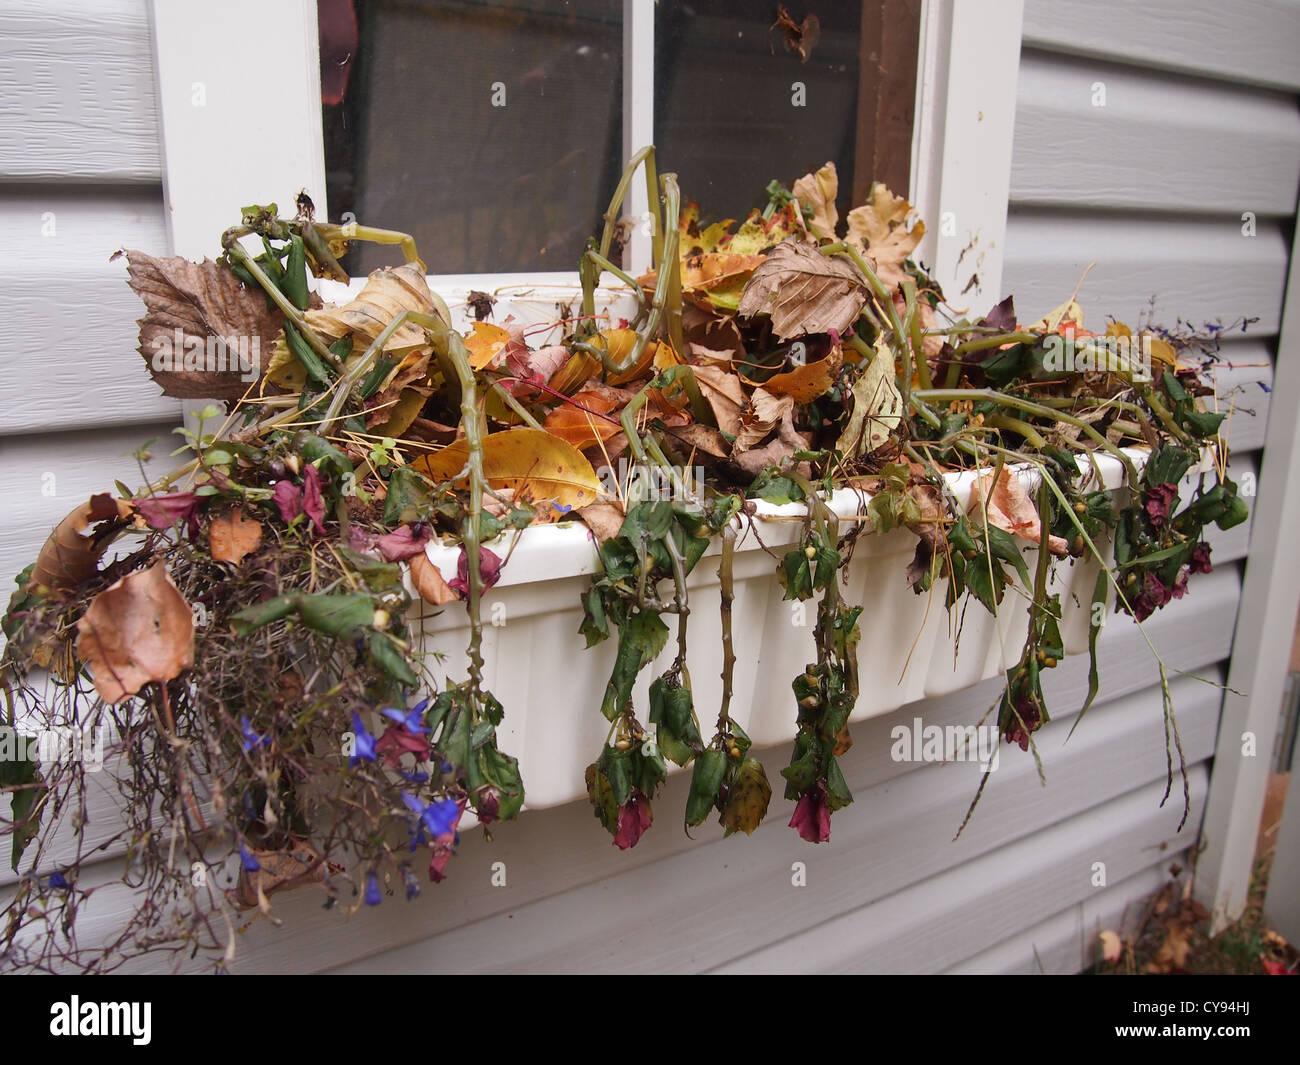 Dead plants in a window planter - Stock Image